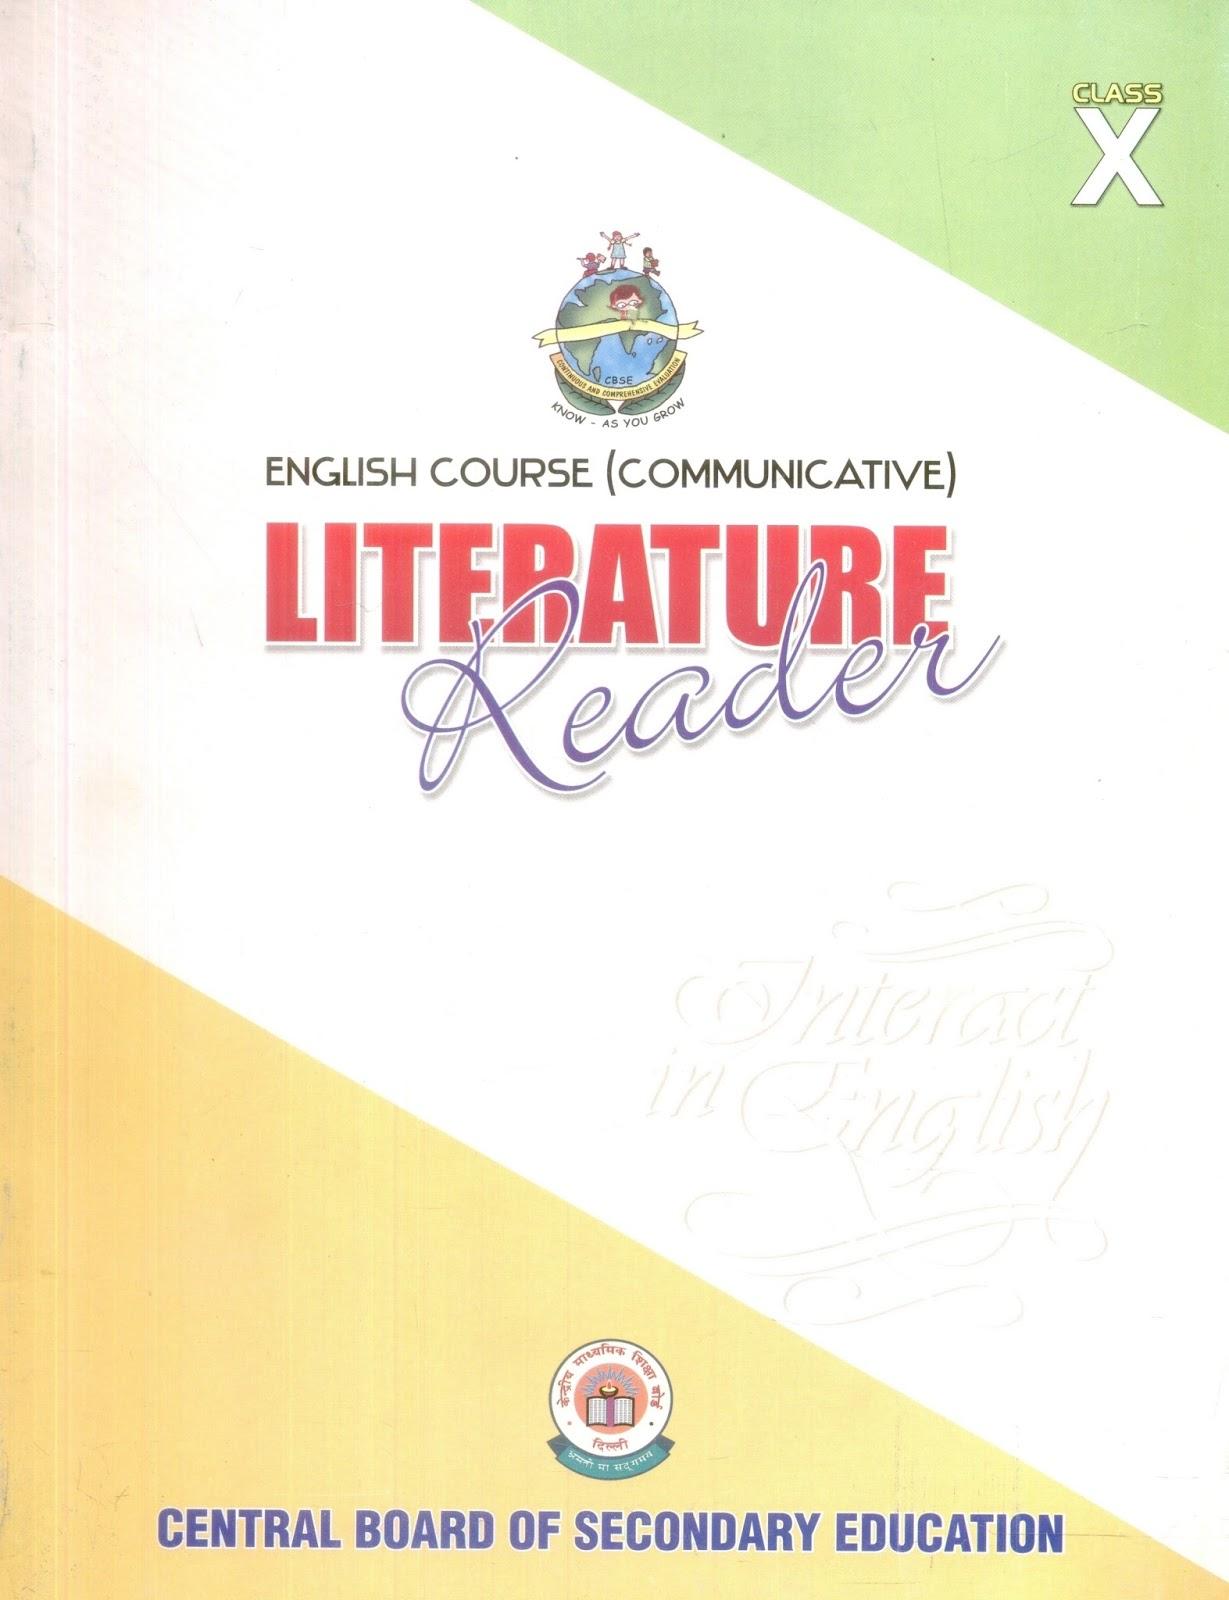 Ncert text books grade 11 physics Coursework Sample